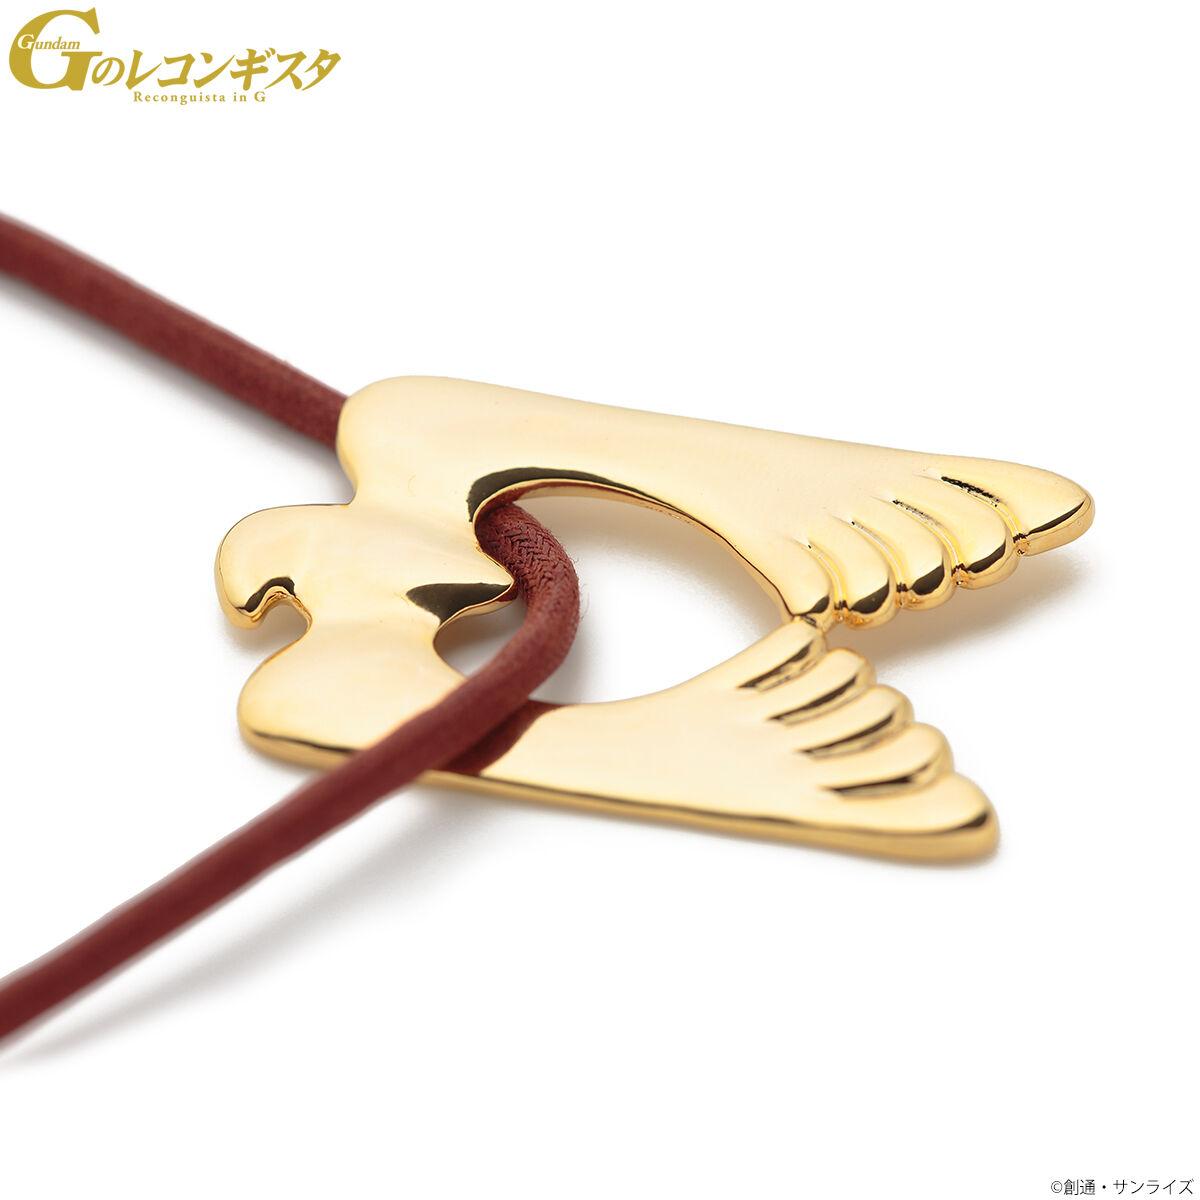 Gundam Reconguista in G Necklace